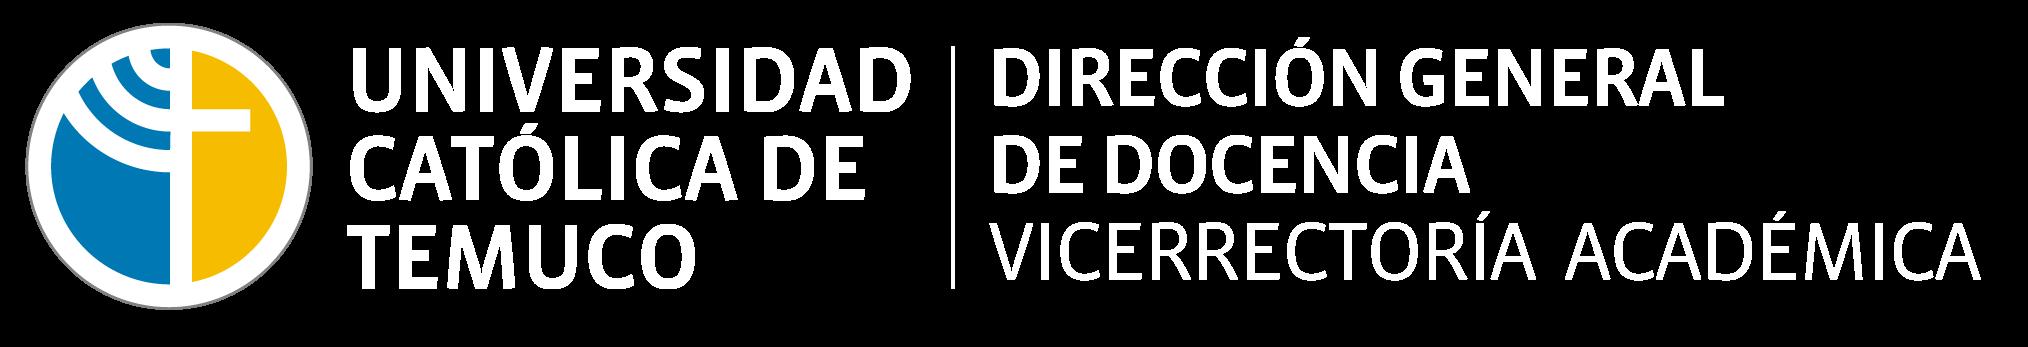 logo de la universidad catolica de temuco